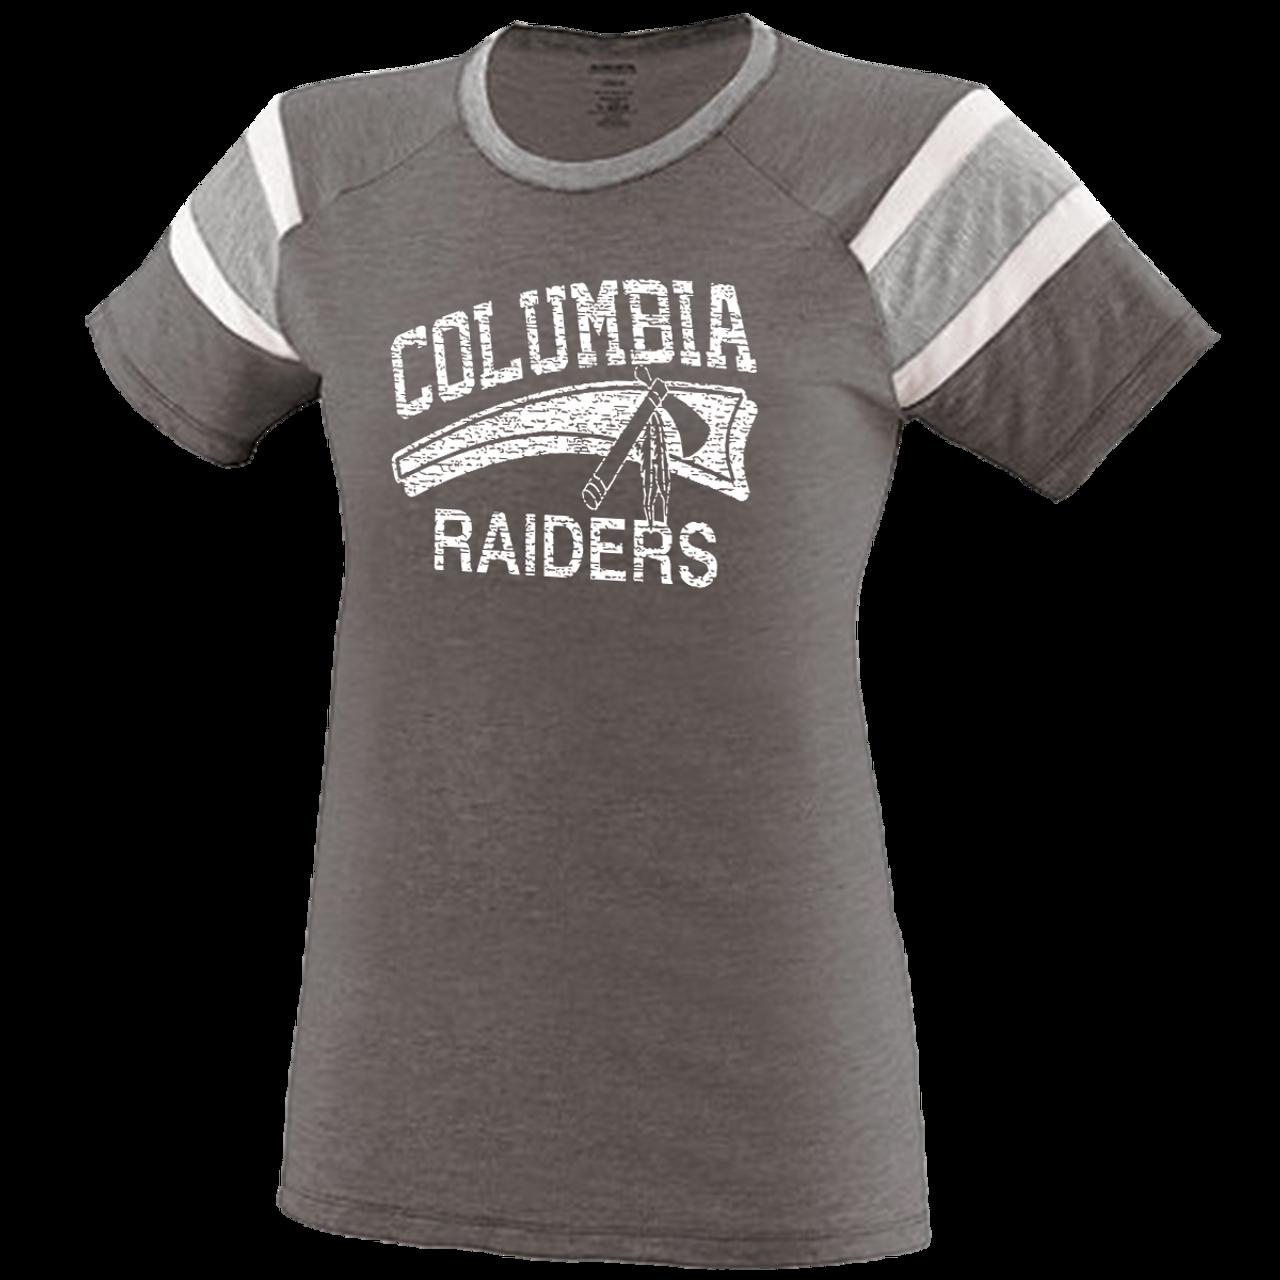 406eaa76bba2f Columbia Raiders Girls Fanatic Tee (F186) - RycoSports